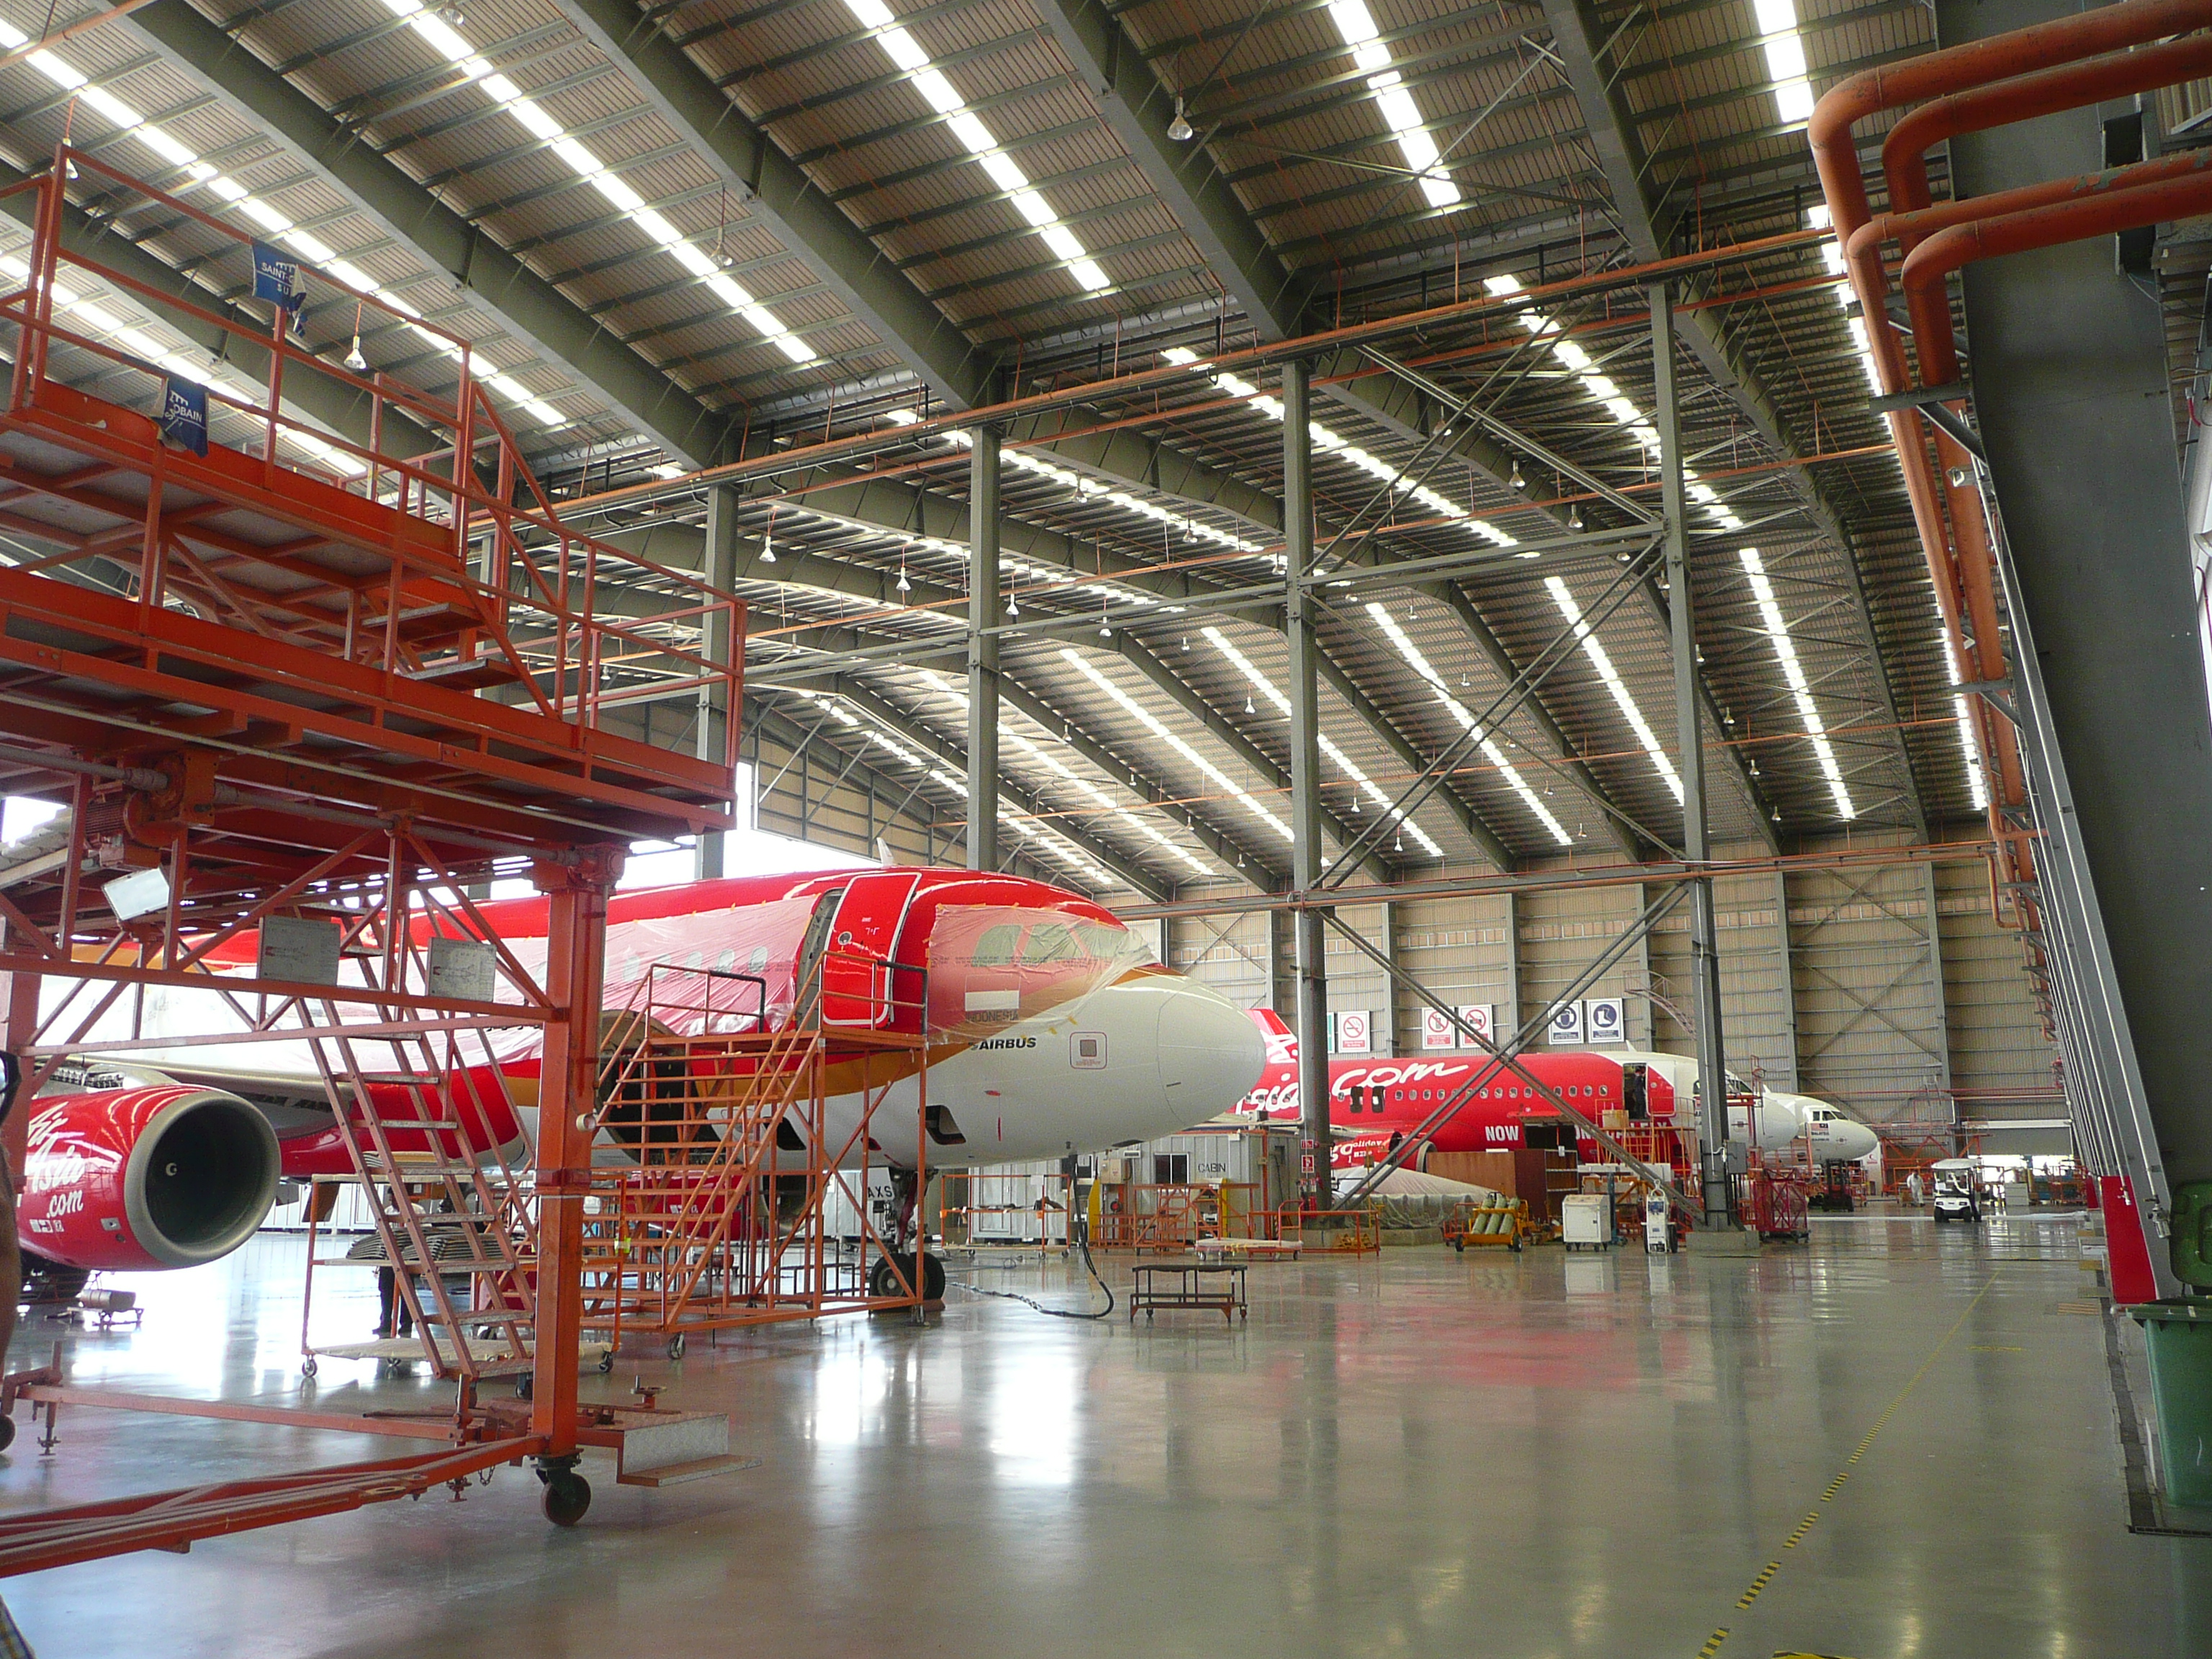 Airbus - Projet SAE - Kuala Lumpur